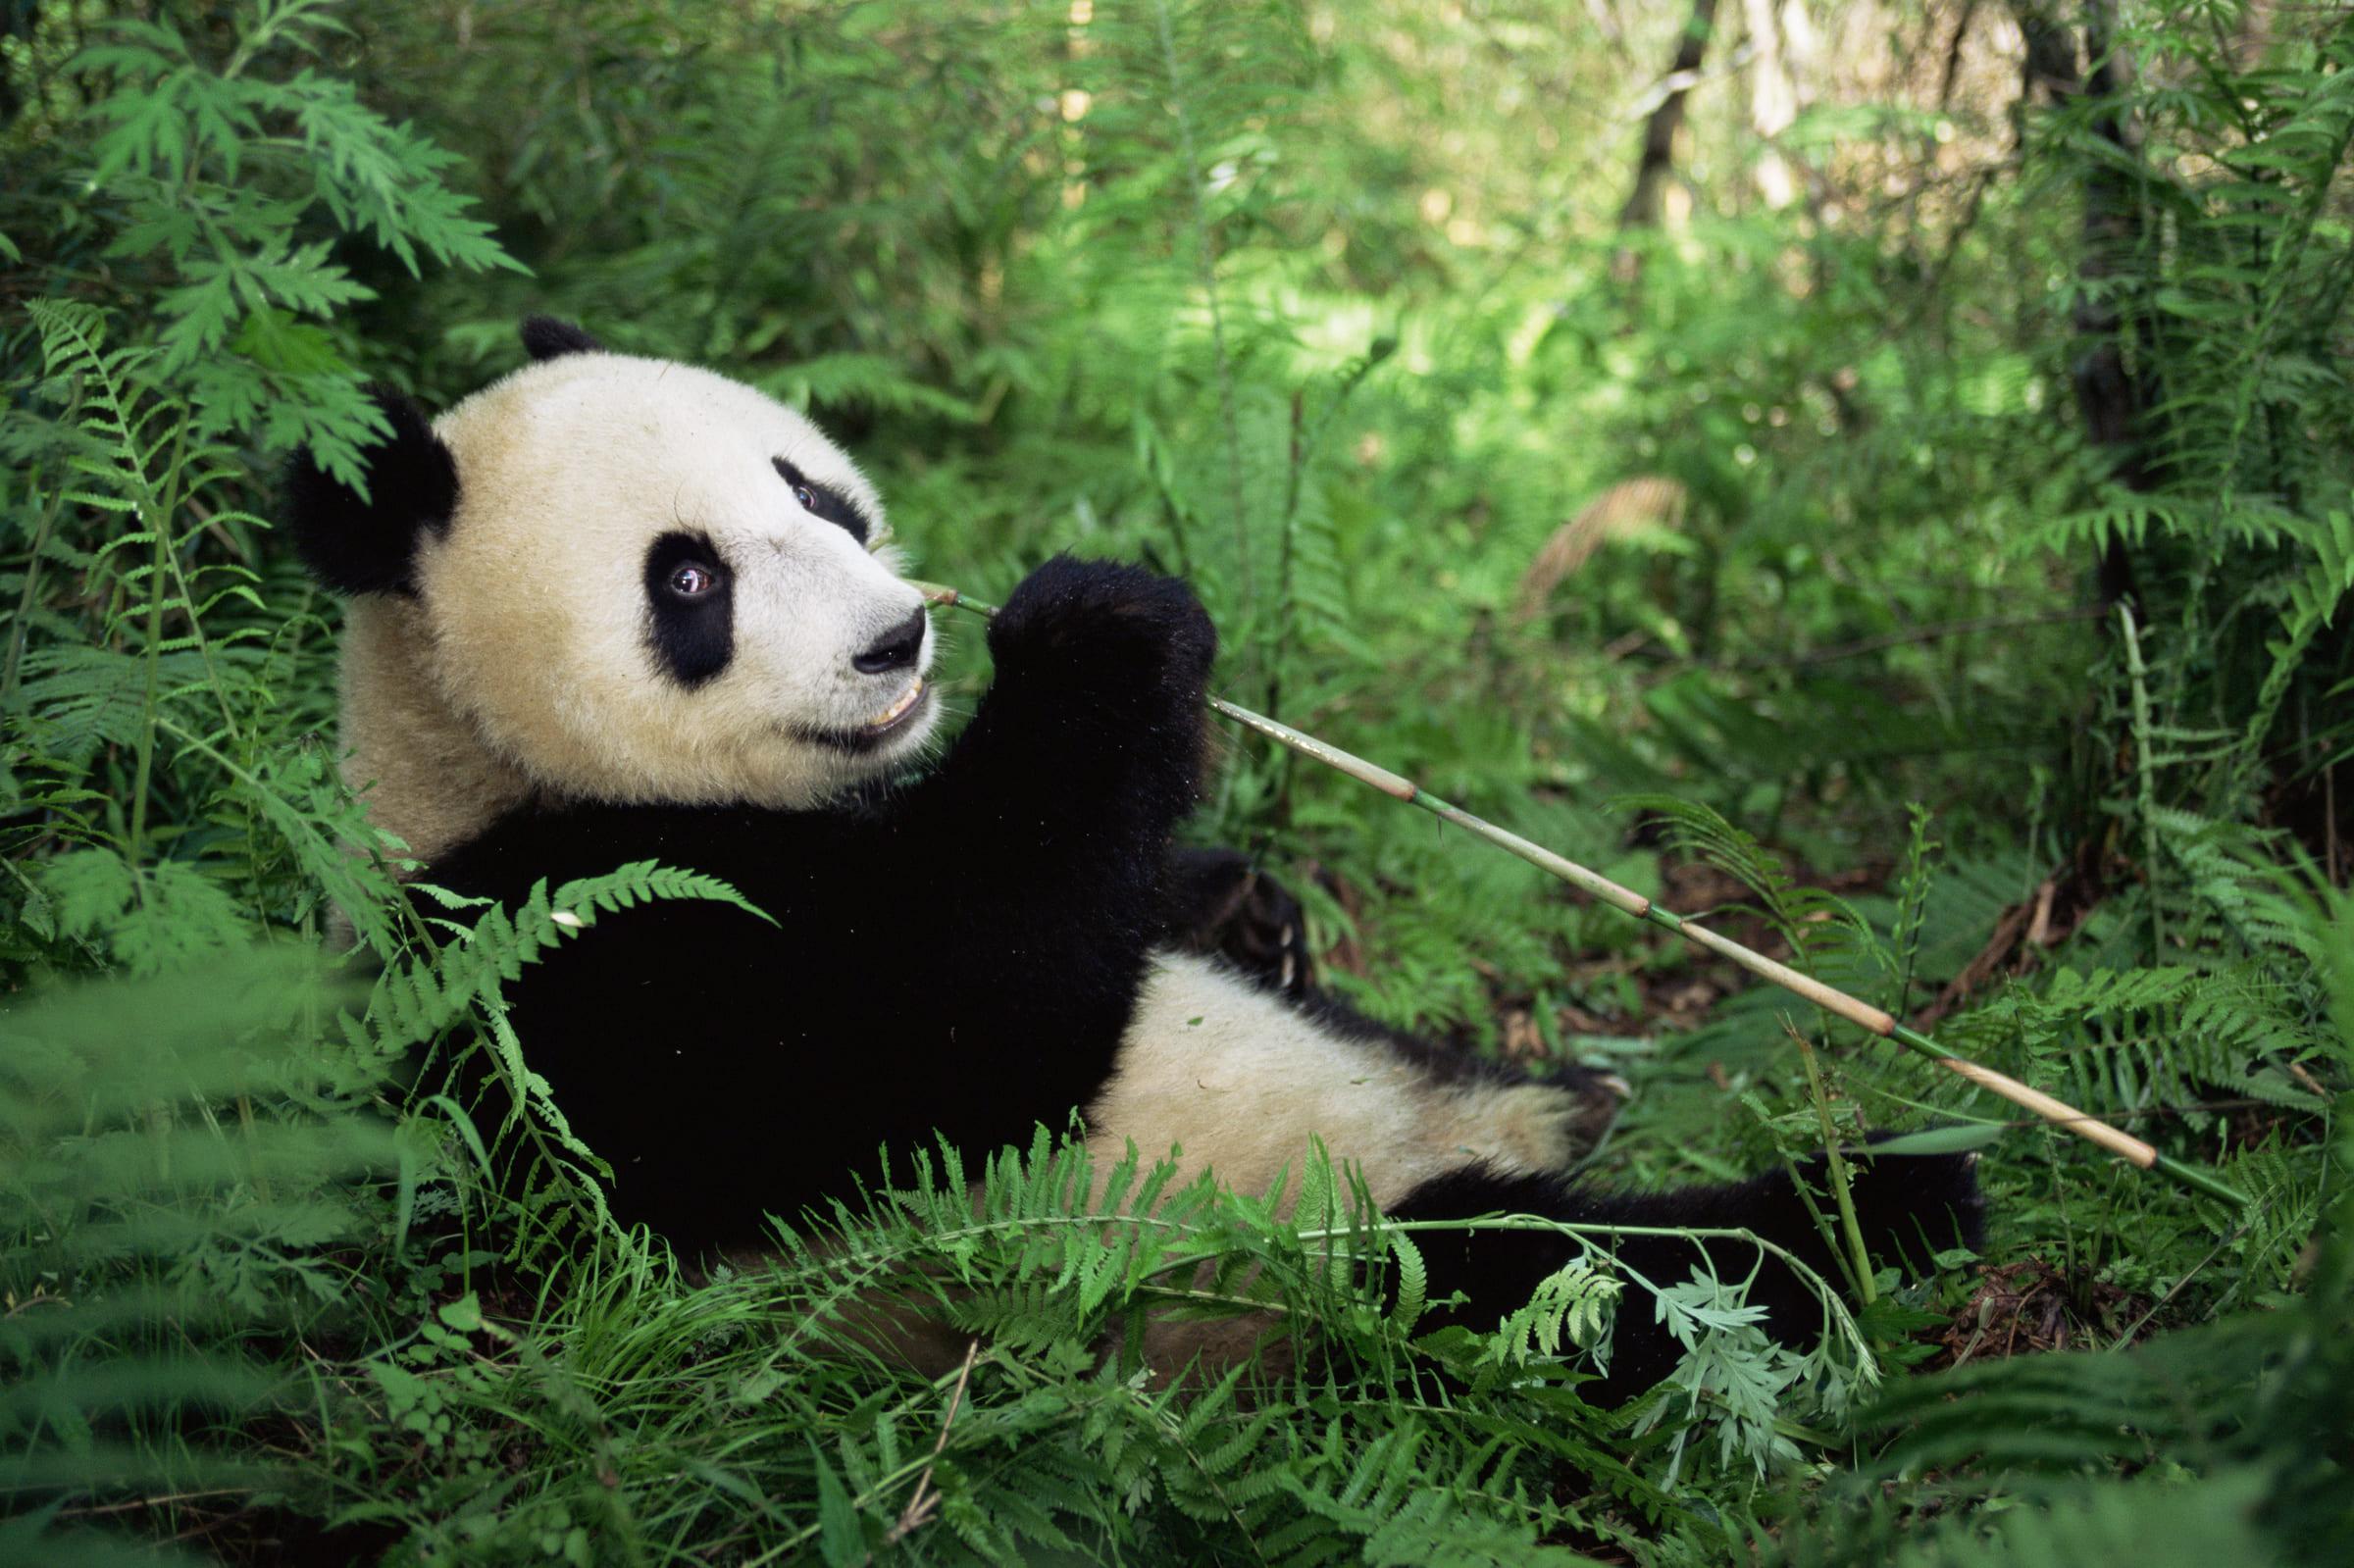 Grosser Panda beim Fressen